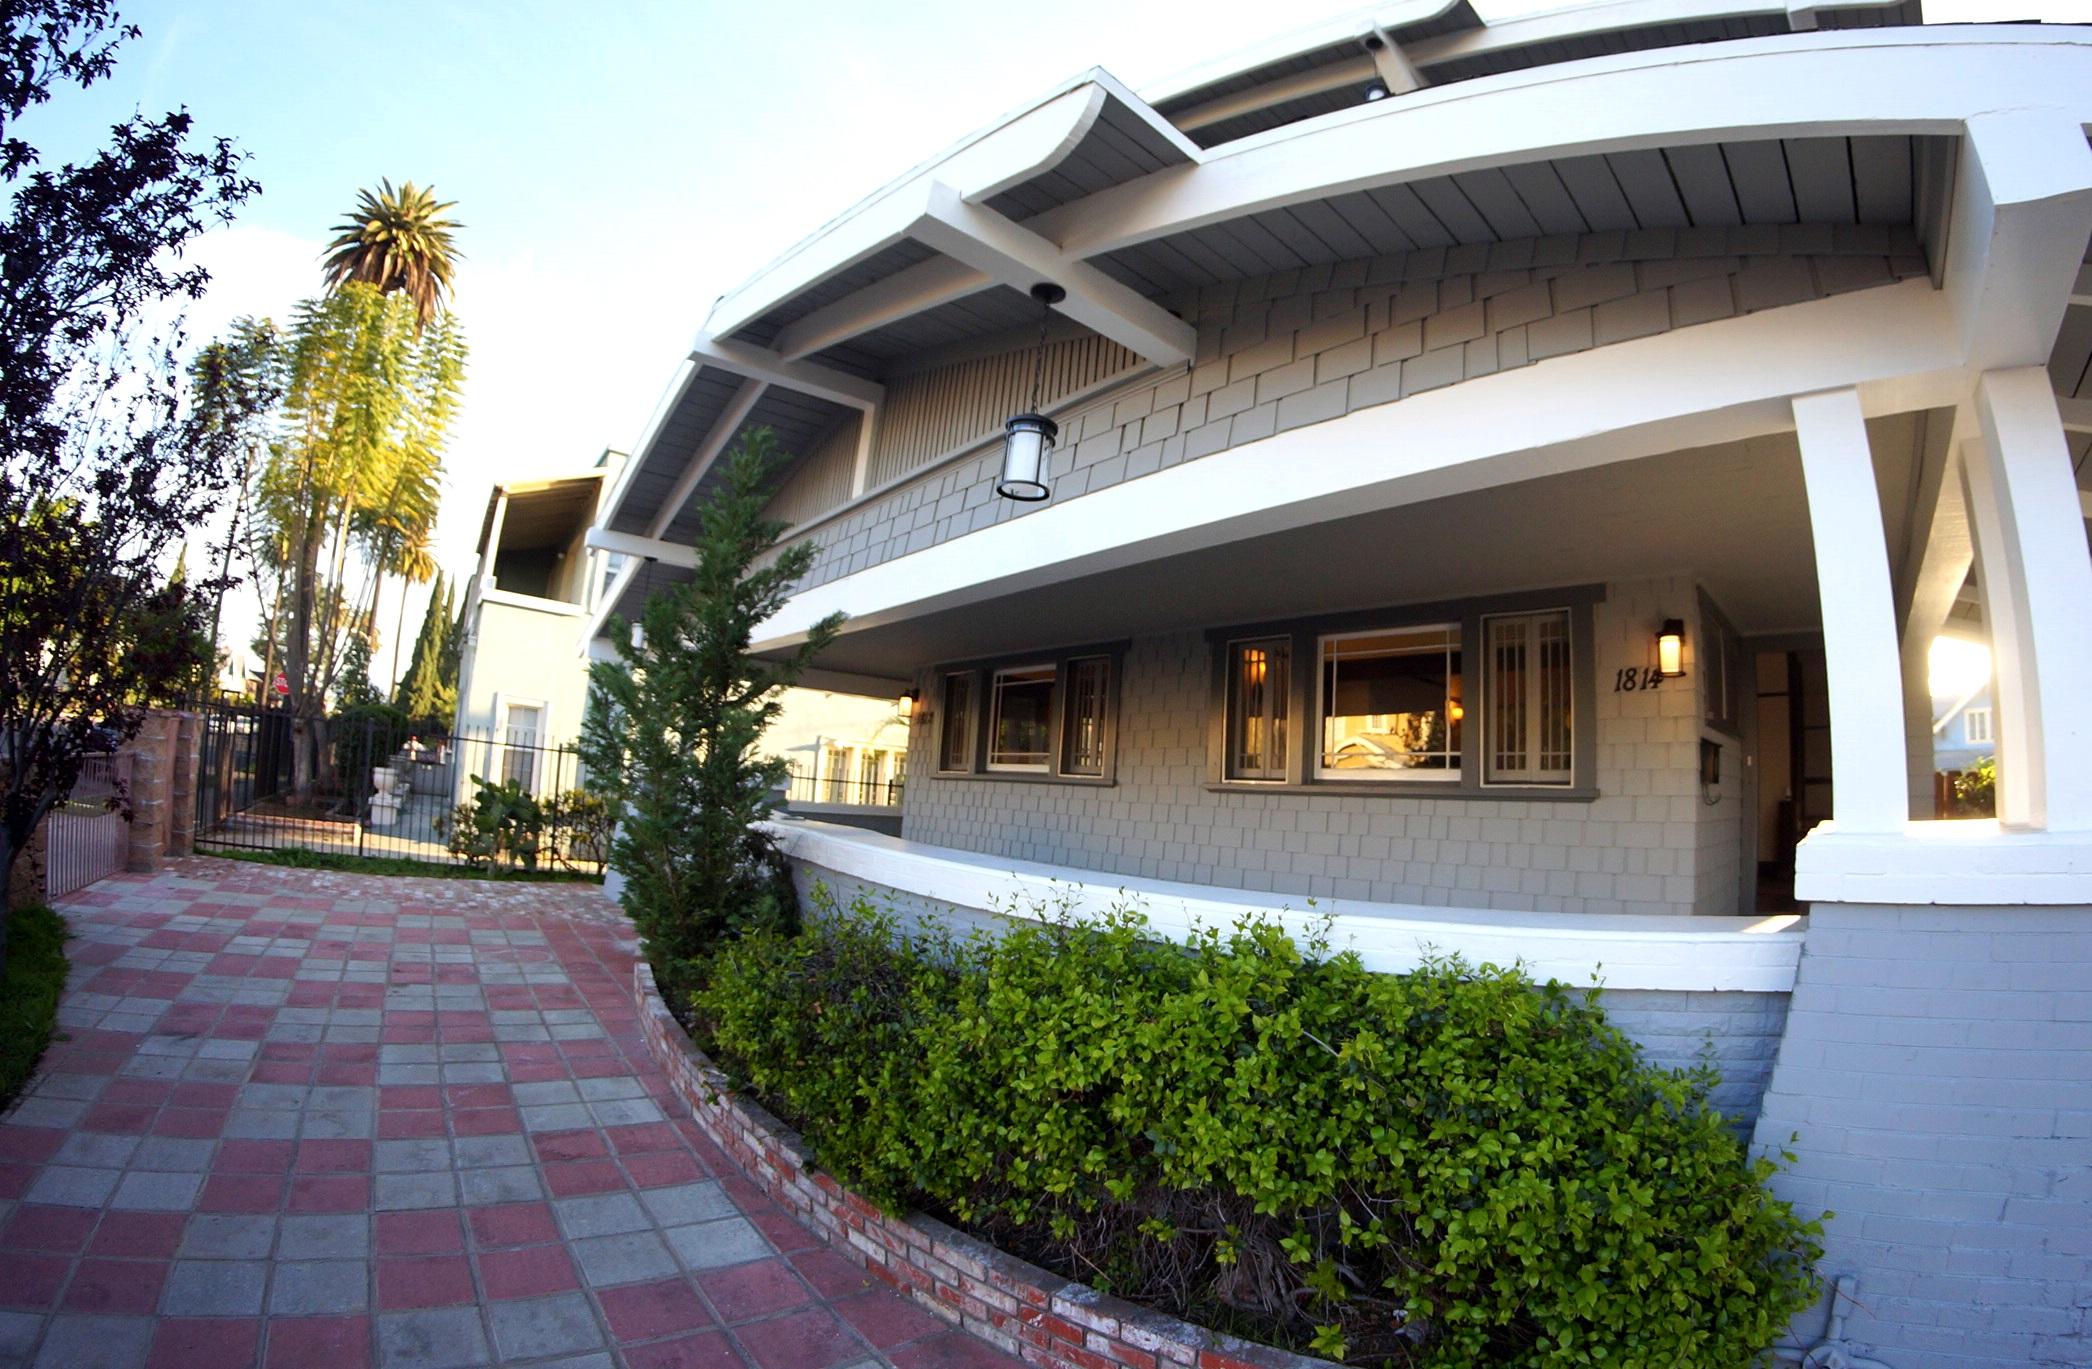 1814 Cimarron St., Los Angeles, CA 90019